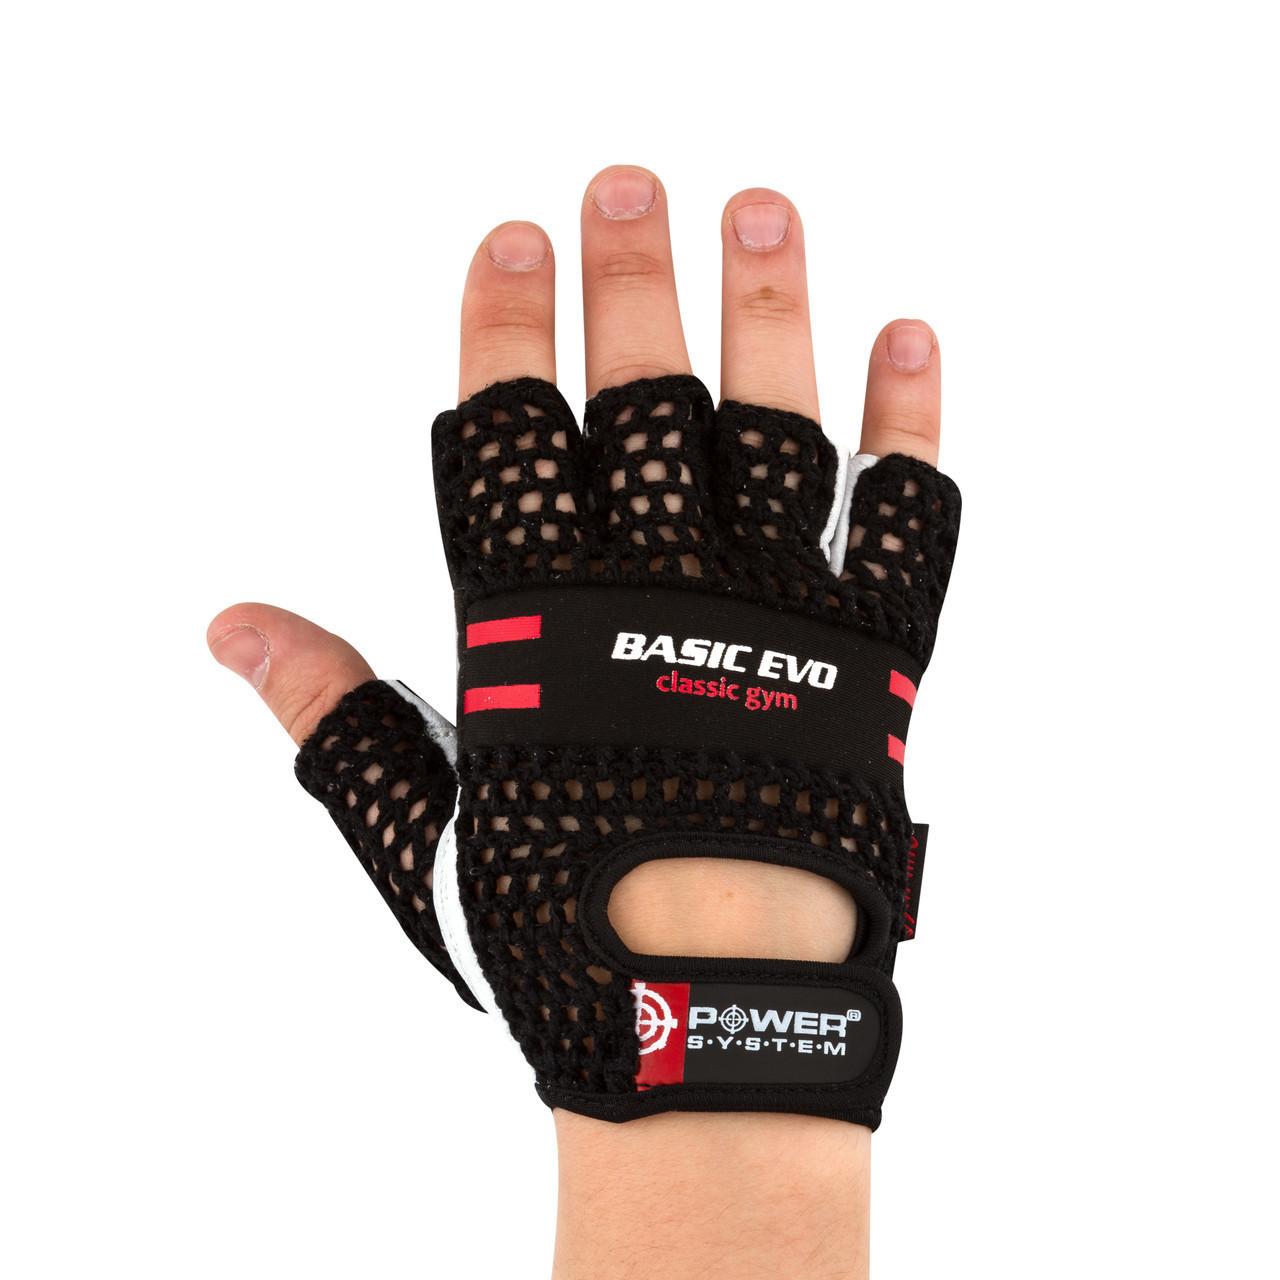 Перчатки для фитнеса и тяжелой атлетики Power System Basic EVO PS-2100 S Black/Red Line